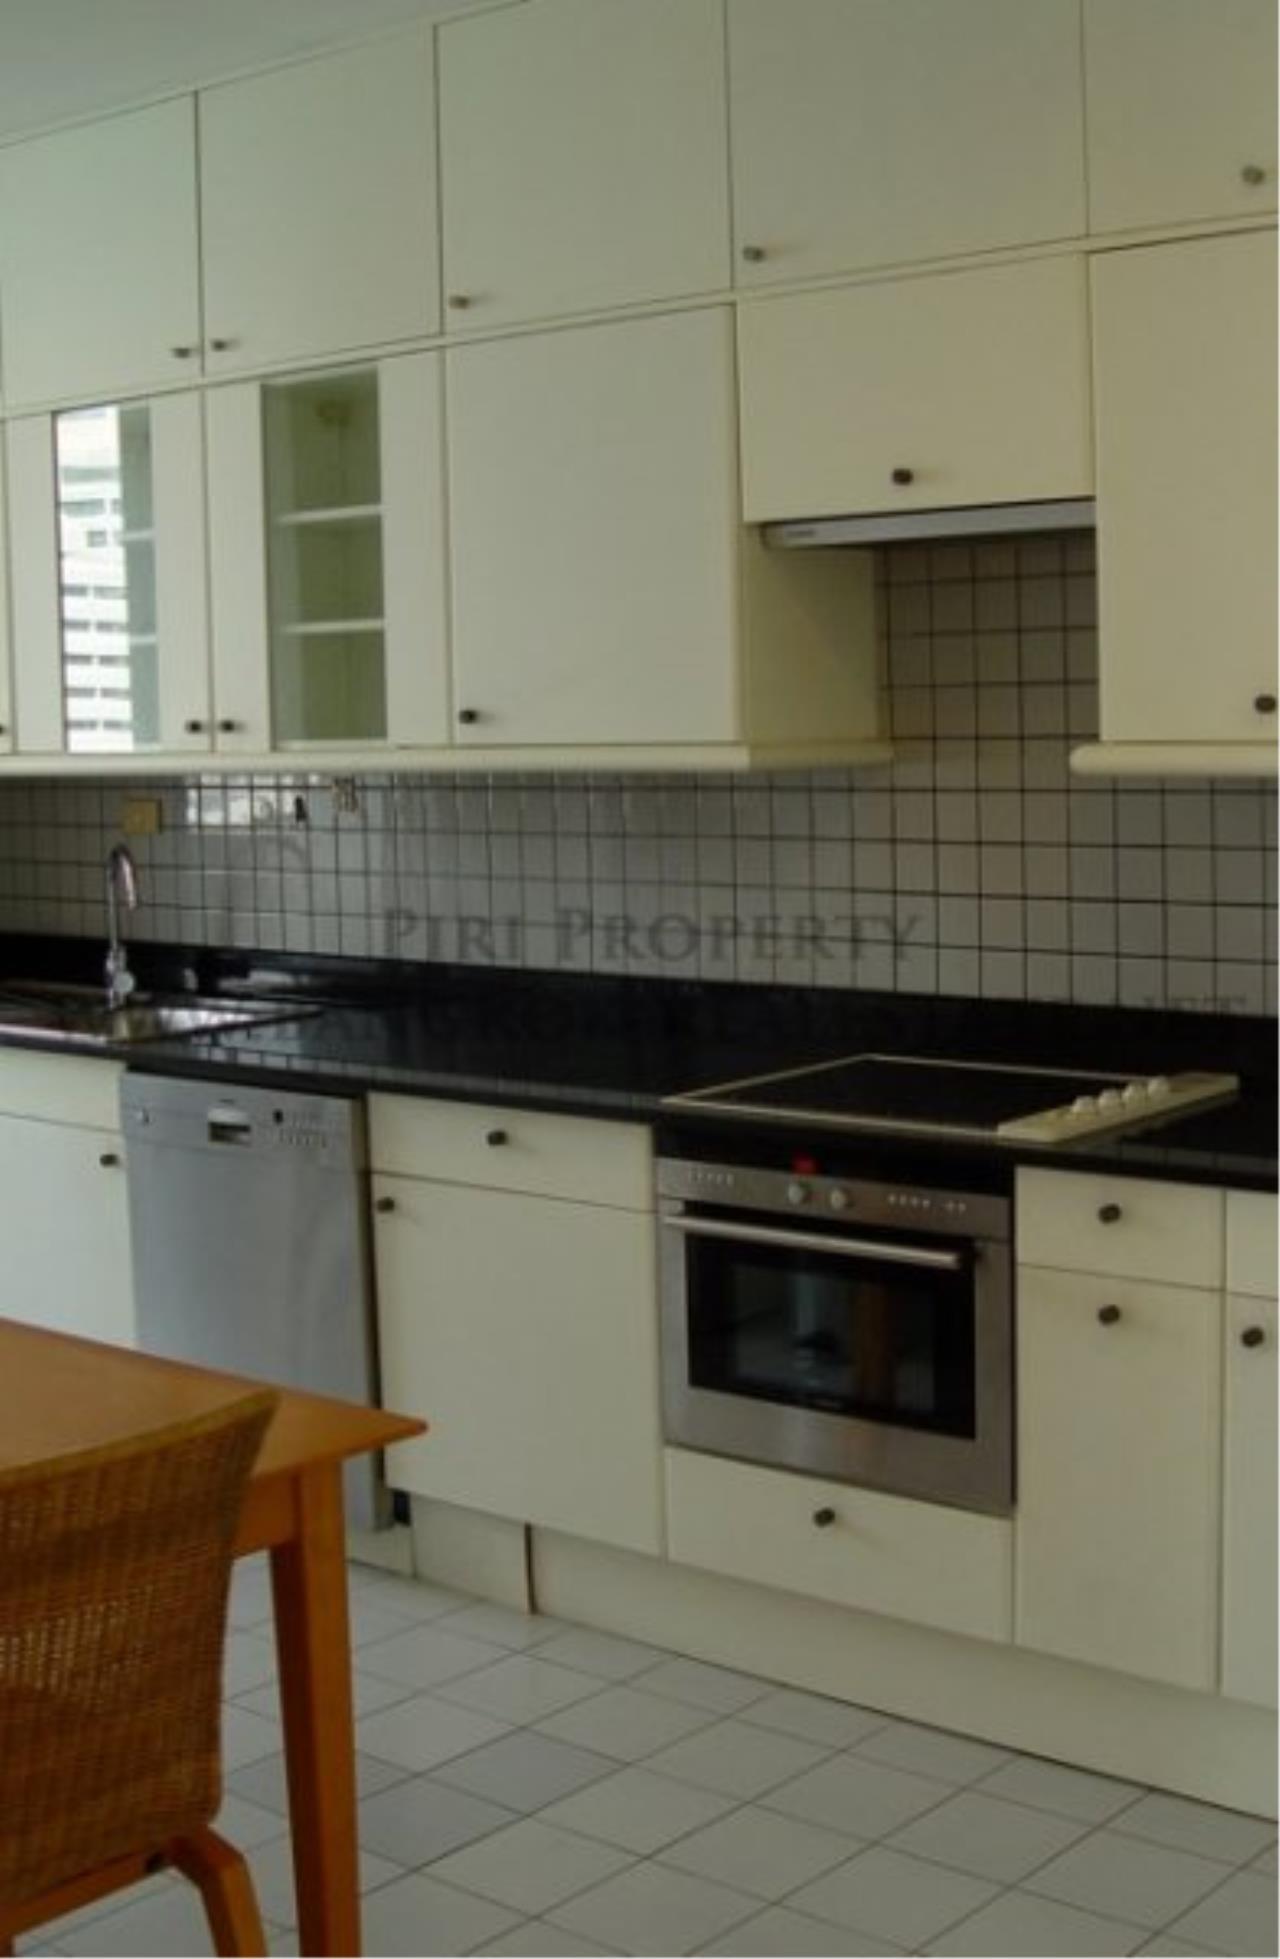 Piri Property Agency's Polo Park Condominium - Huge 2 Bedroom with 220 SQM 7